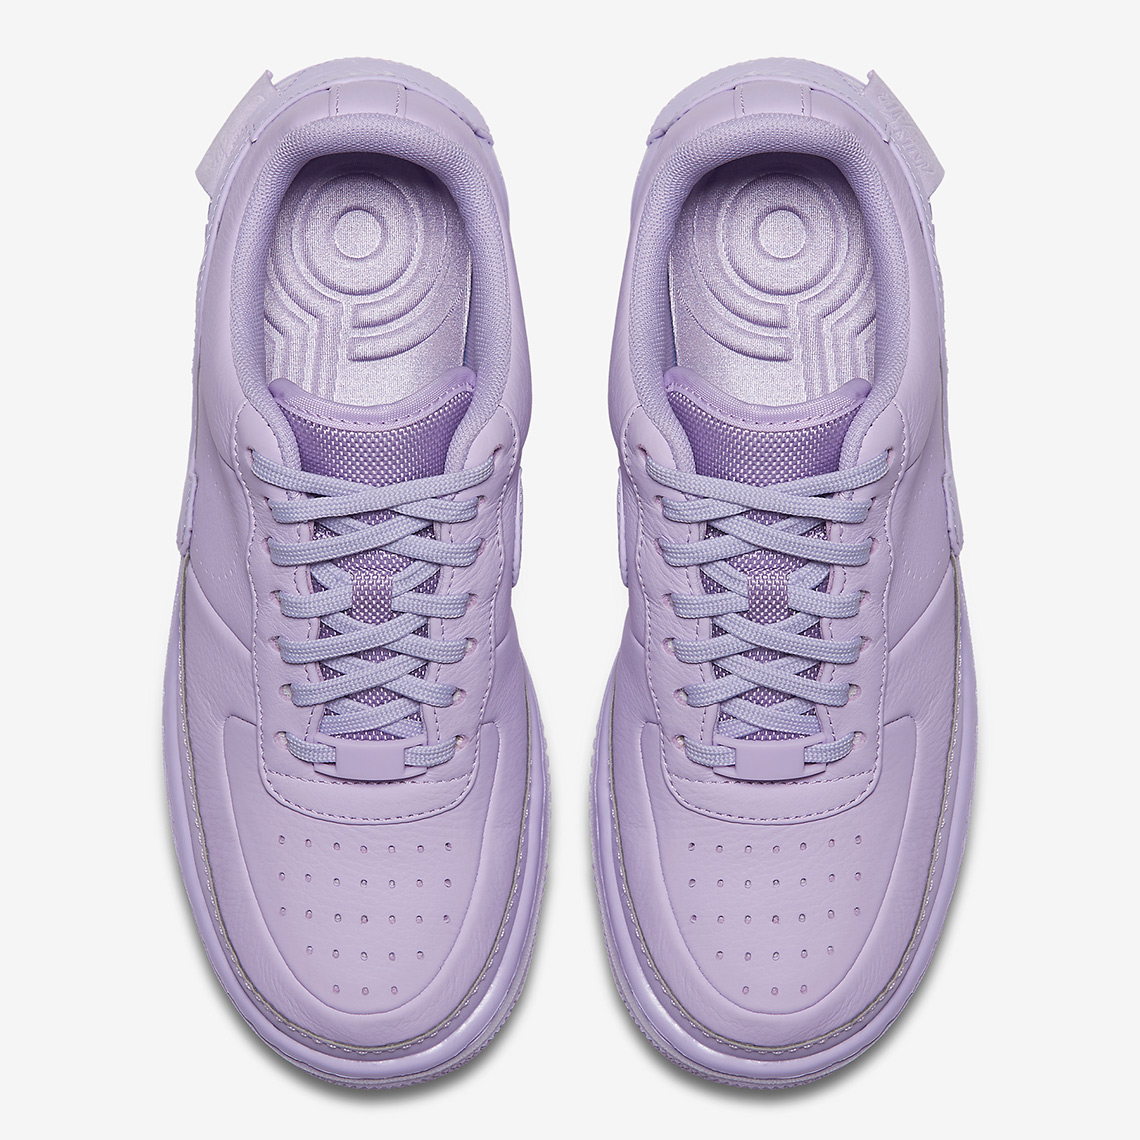 air force 1 violette